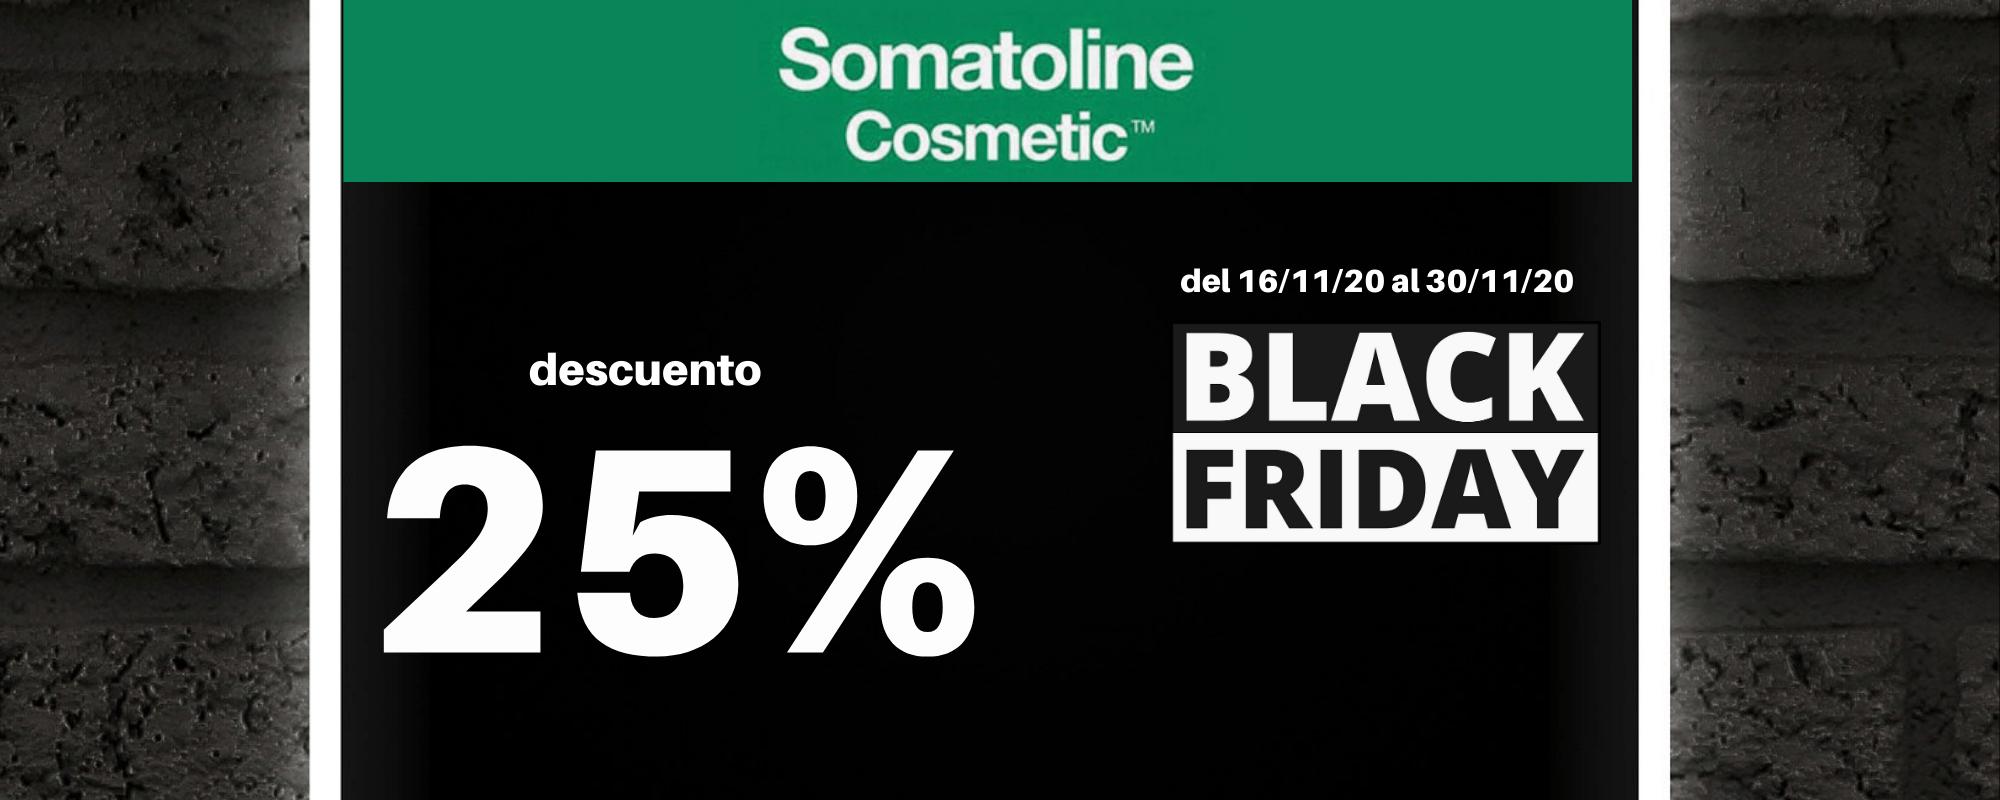 Banner Black Friday Somatoline Farmacia Ciudad Alta